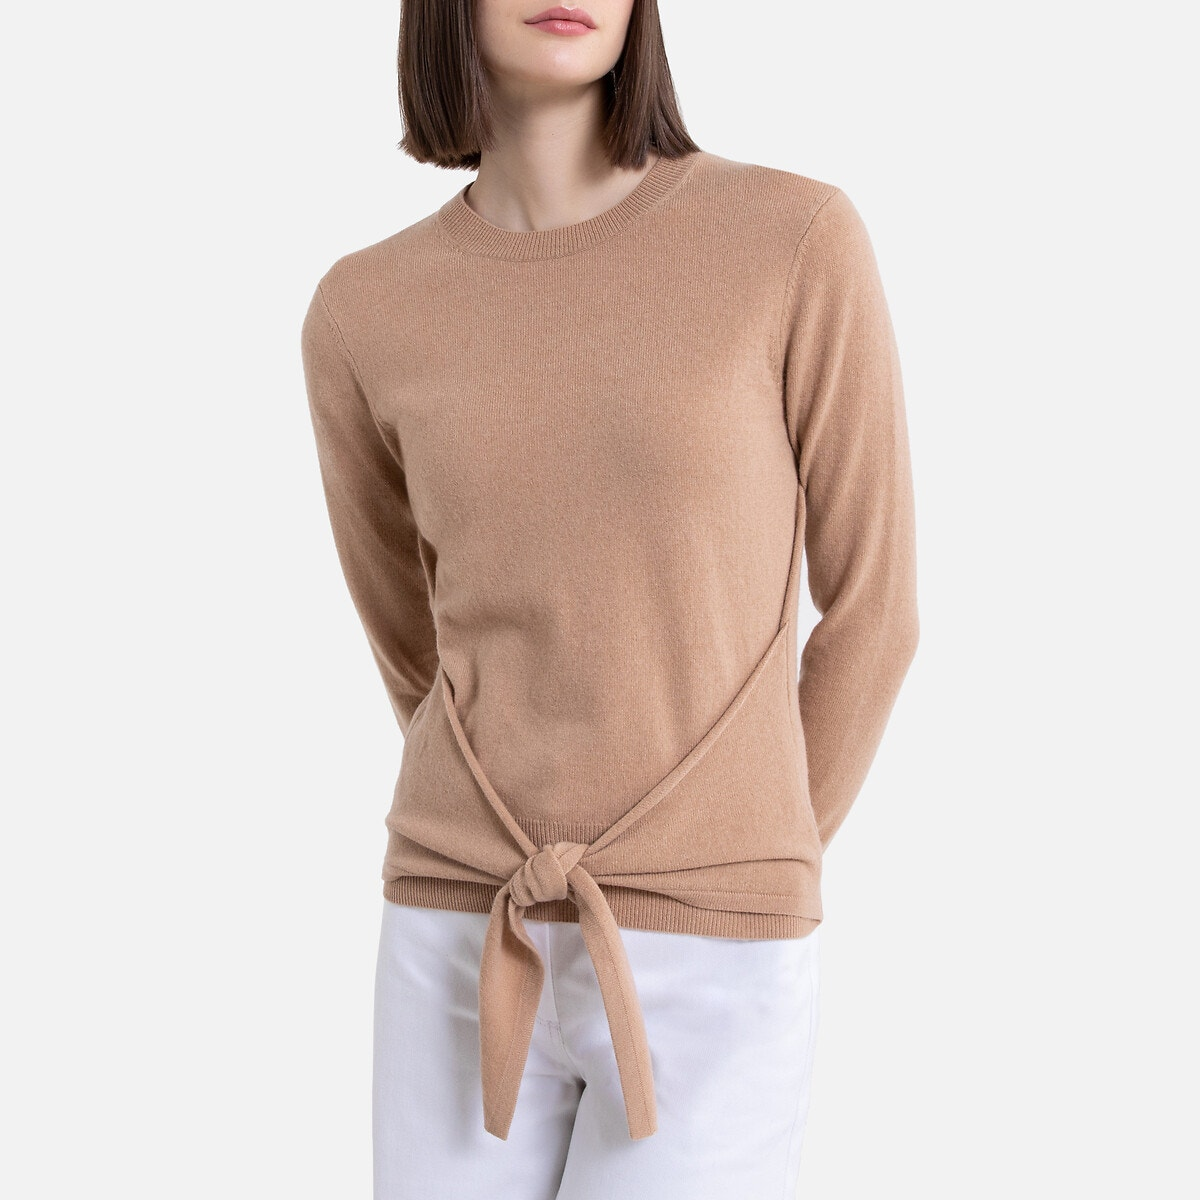 Jersey de lana mayoritariamente cachemir